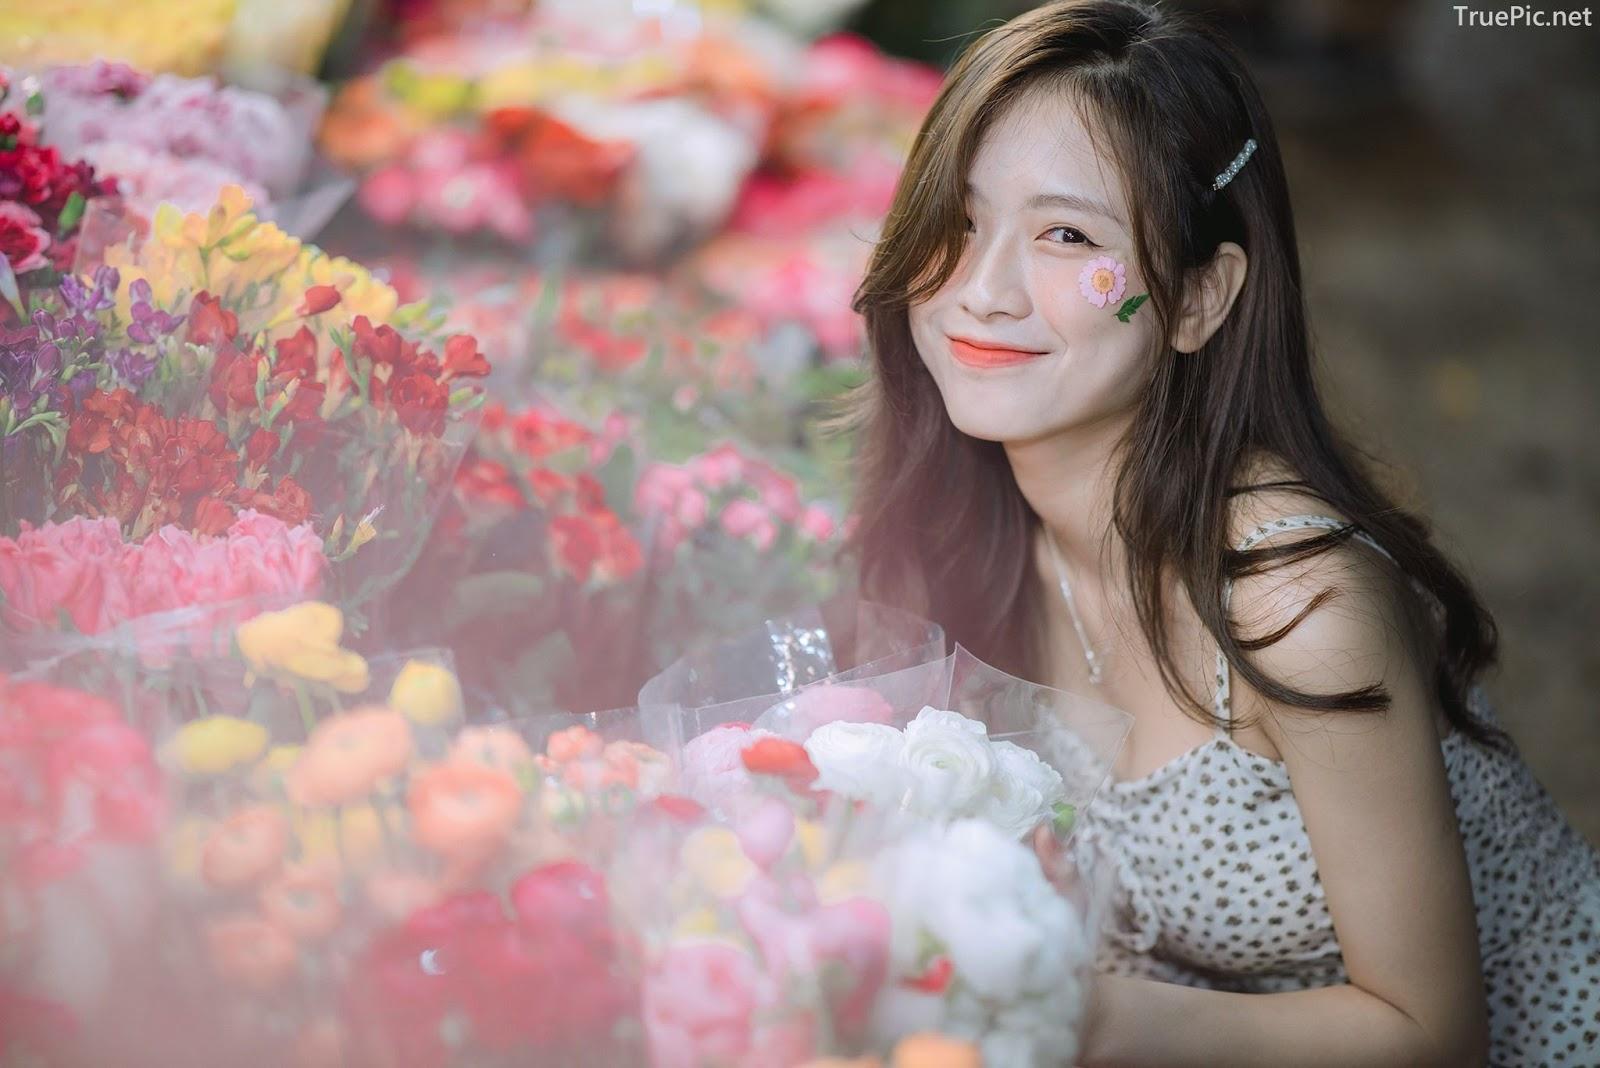 Vietnamese Hot Girl Linh Hoai - Strolling on the flower street - TruePic.net - Picture 4